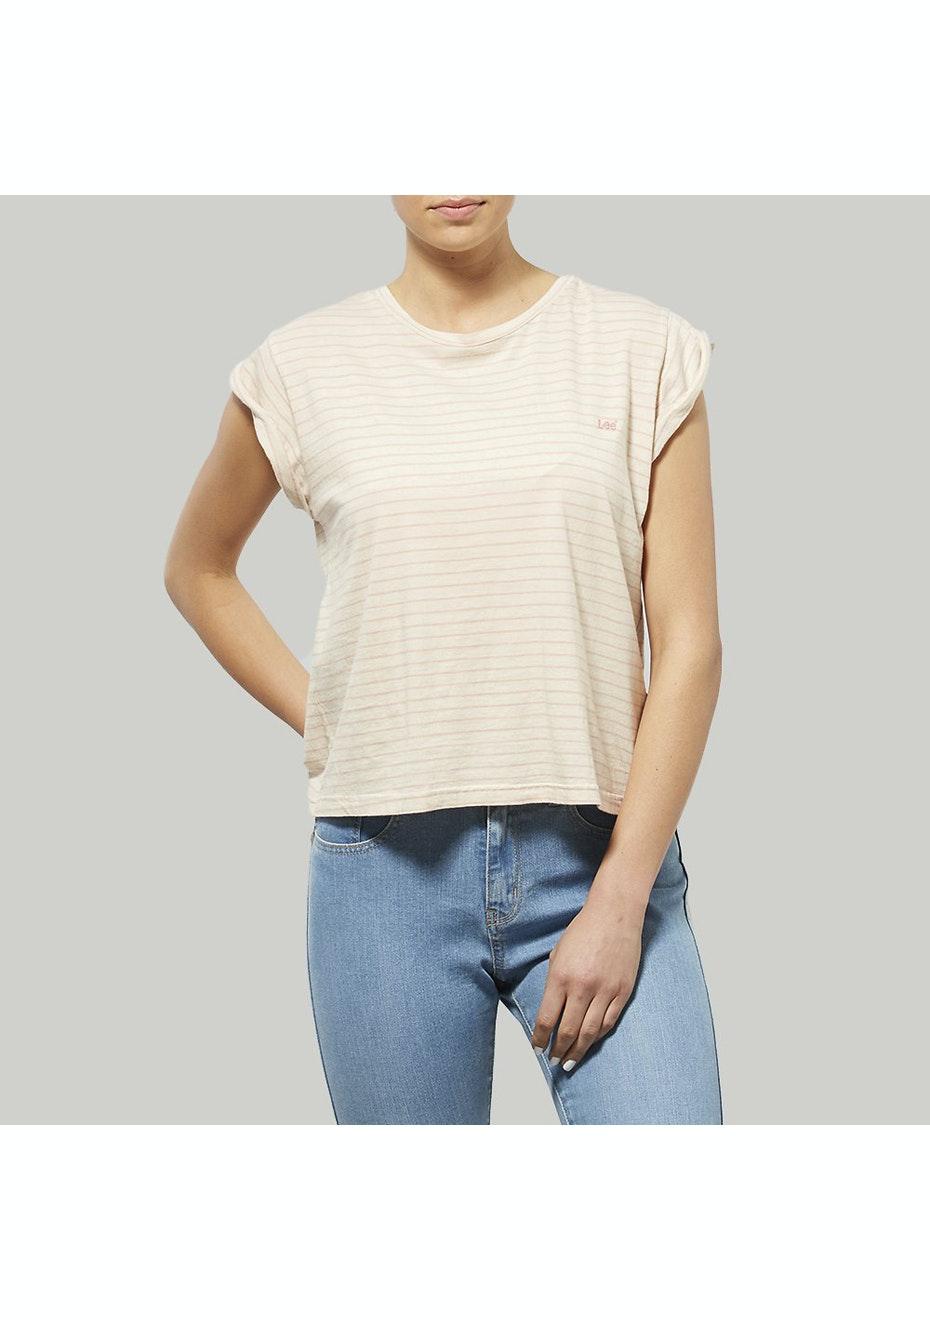 Lee Womens - No Brainer Stripe Tee Blush / Stone